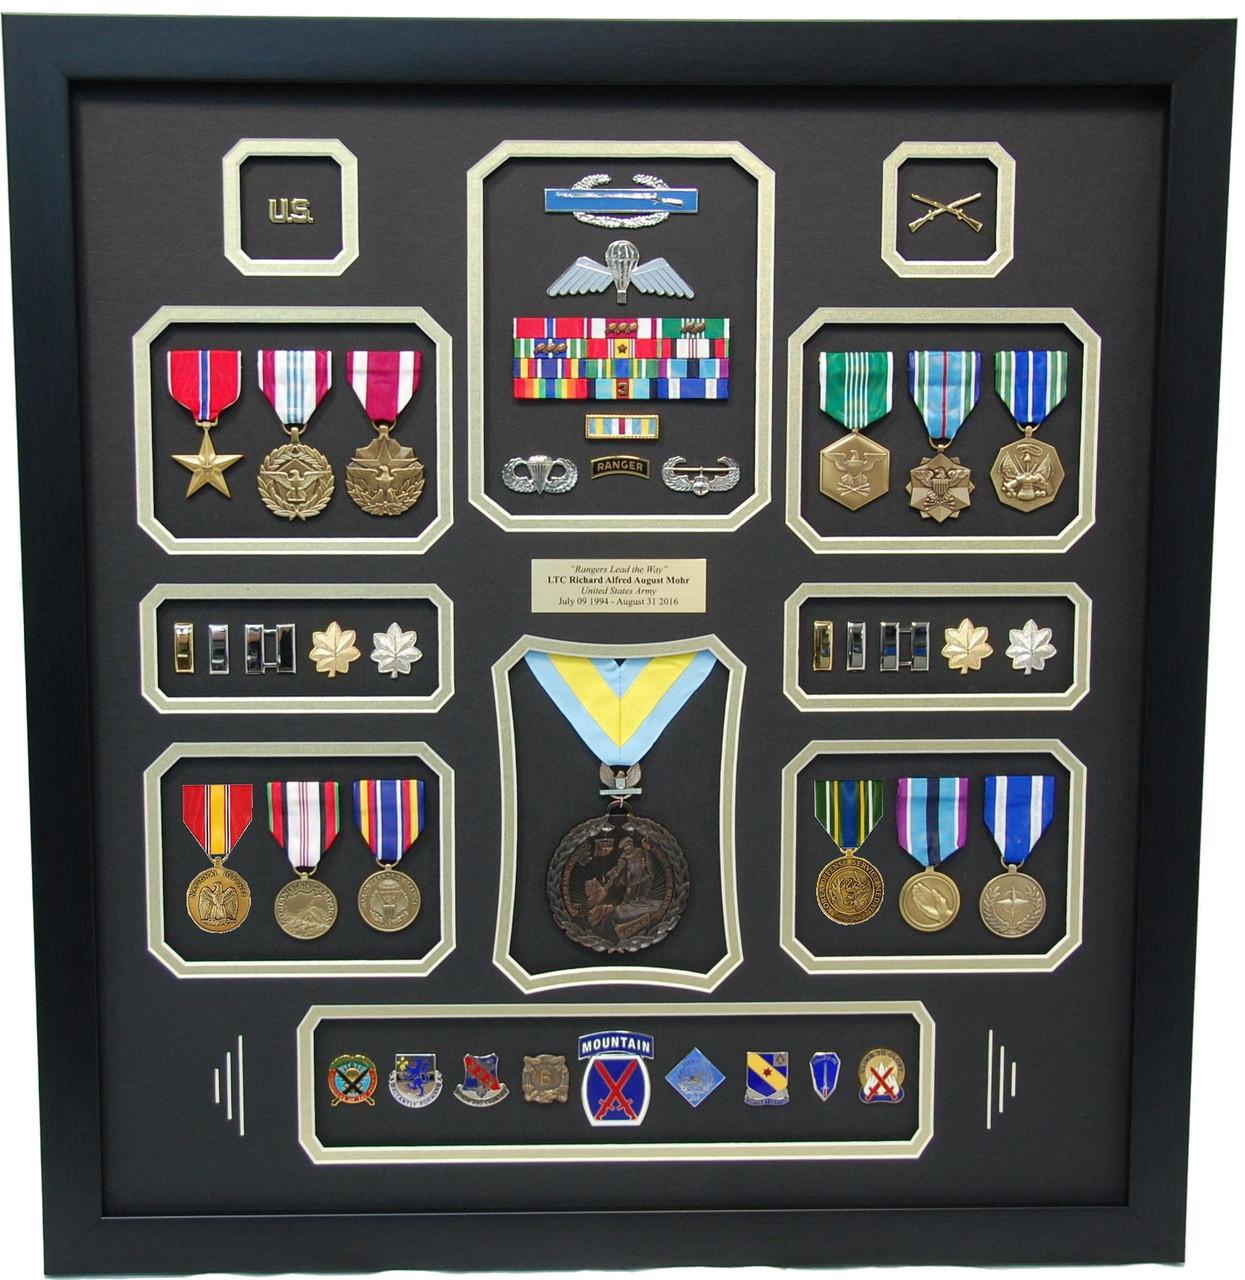 U S Army Ranger Shadow Box Display Frame Military